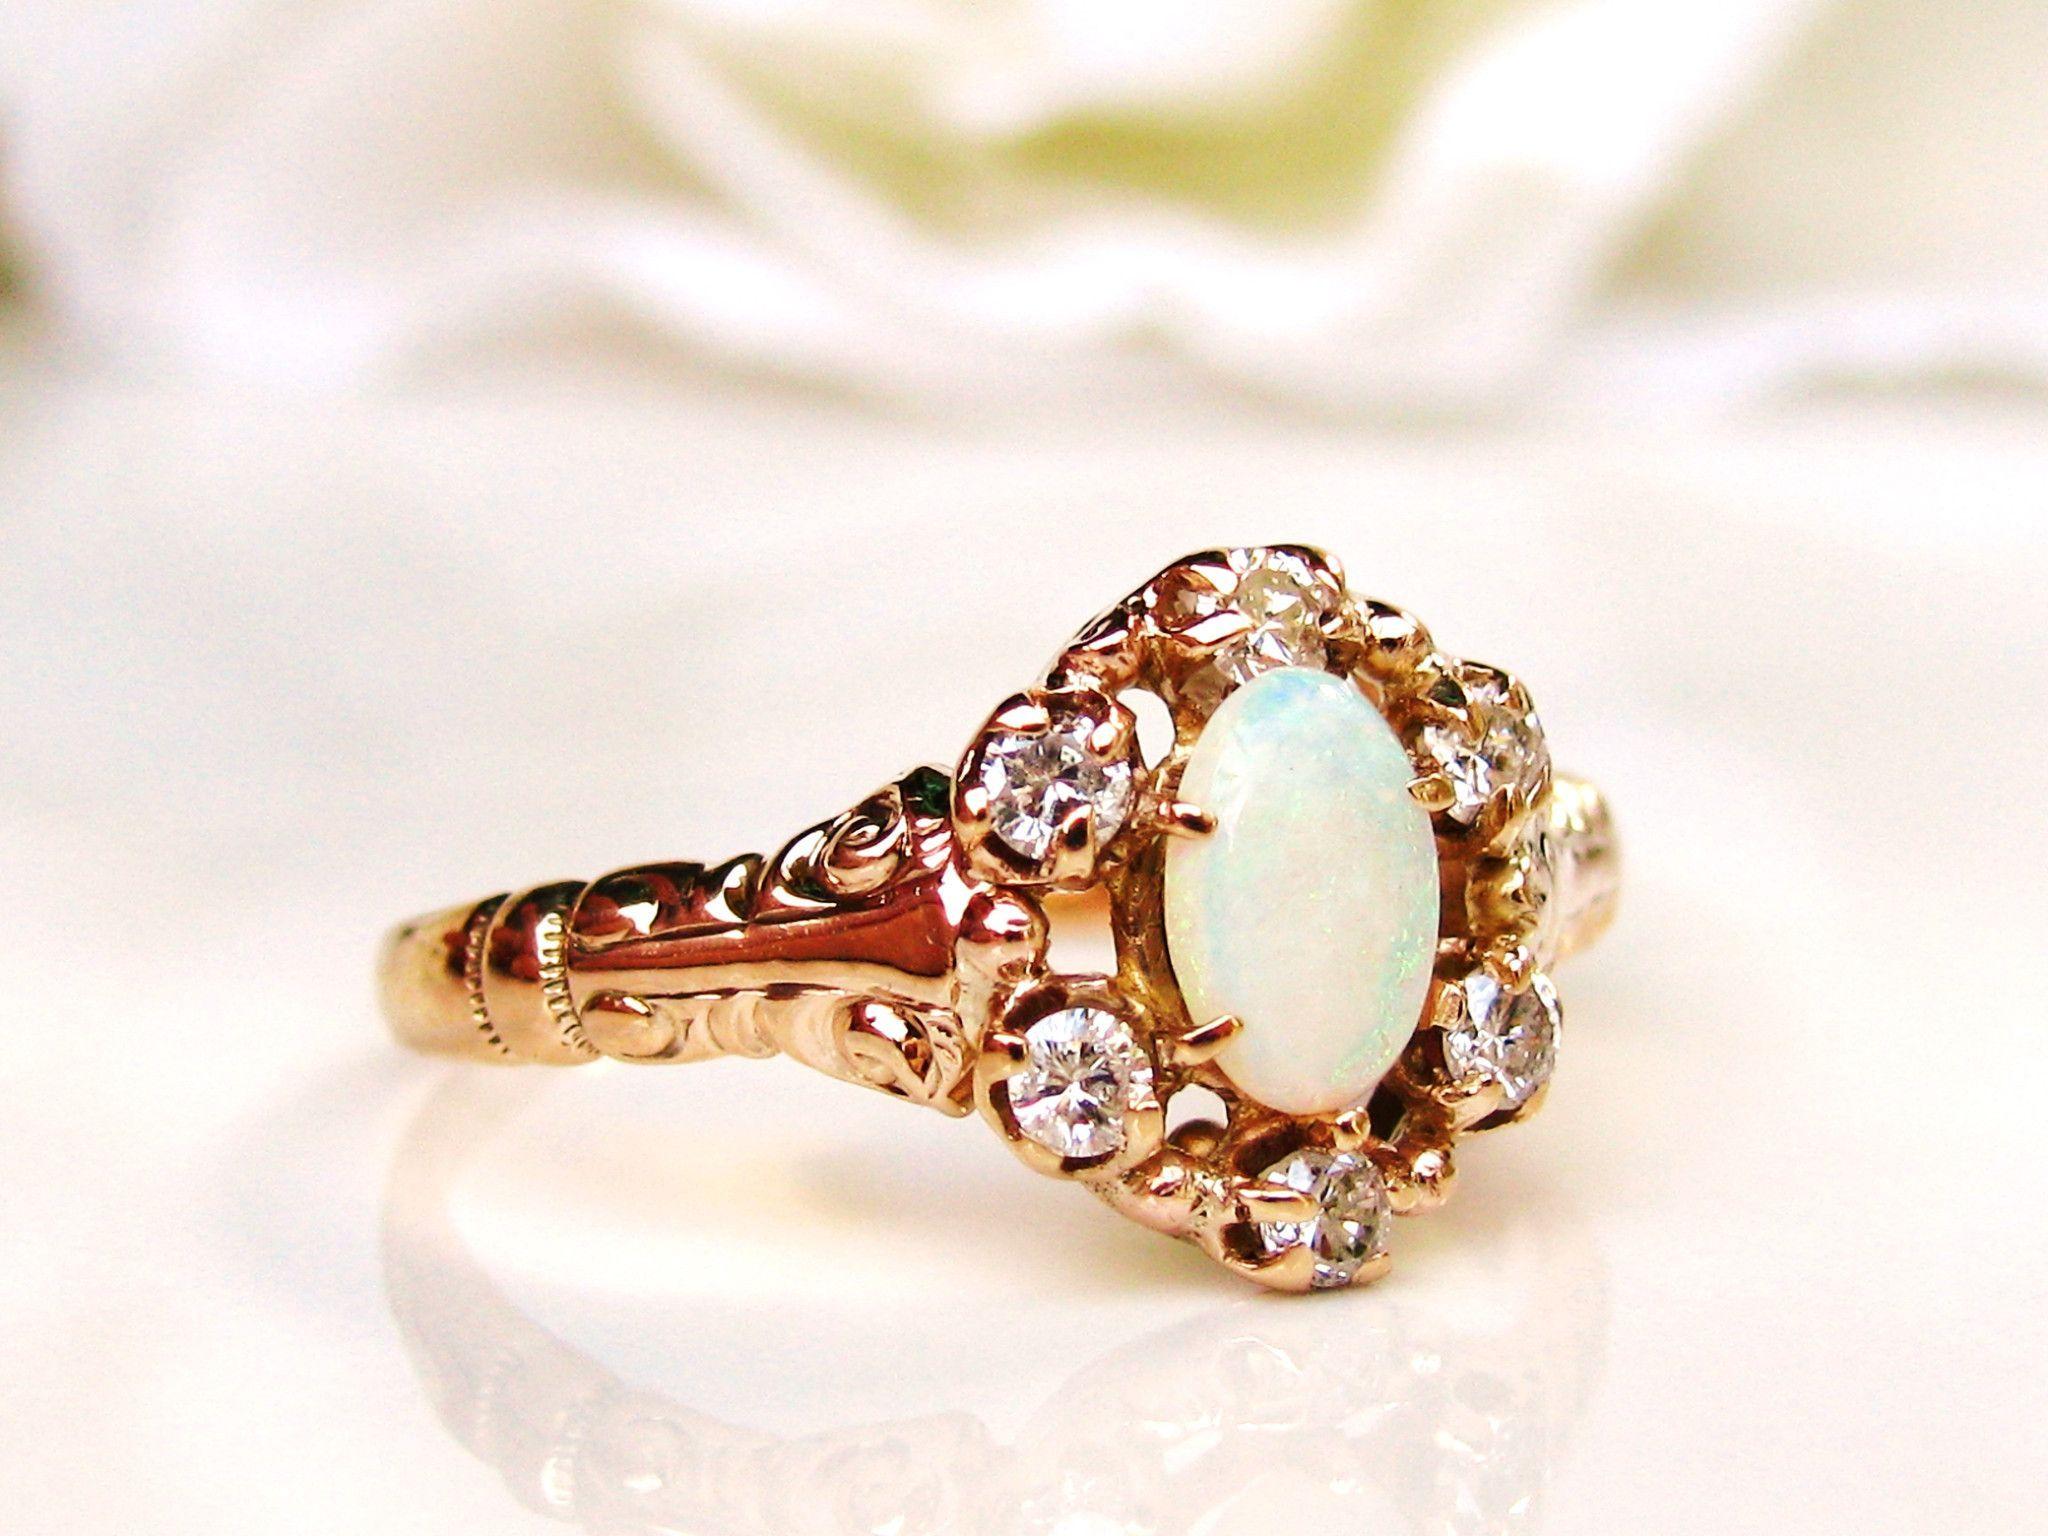 Vintage Opal Diamond Ring Alternative Engagement 14k Gold Dainty Victorian Style Wedding